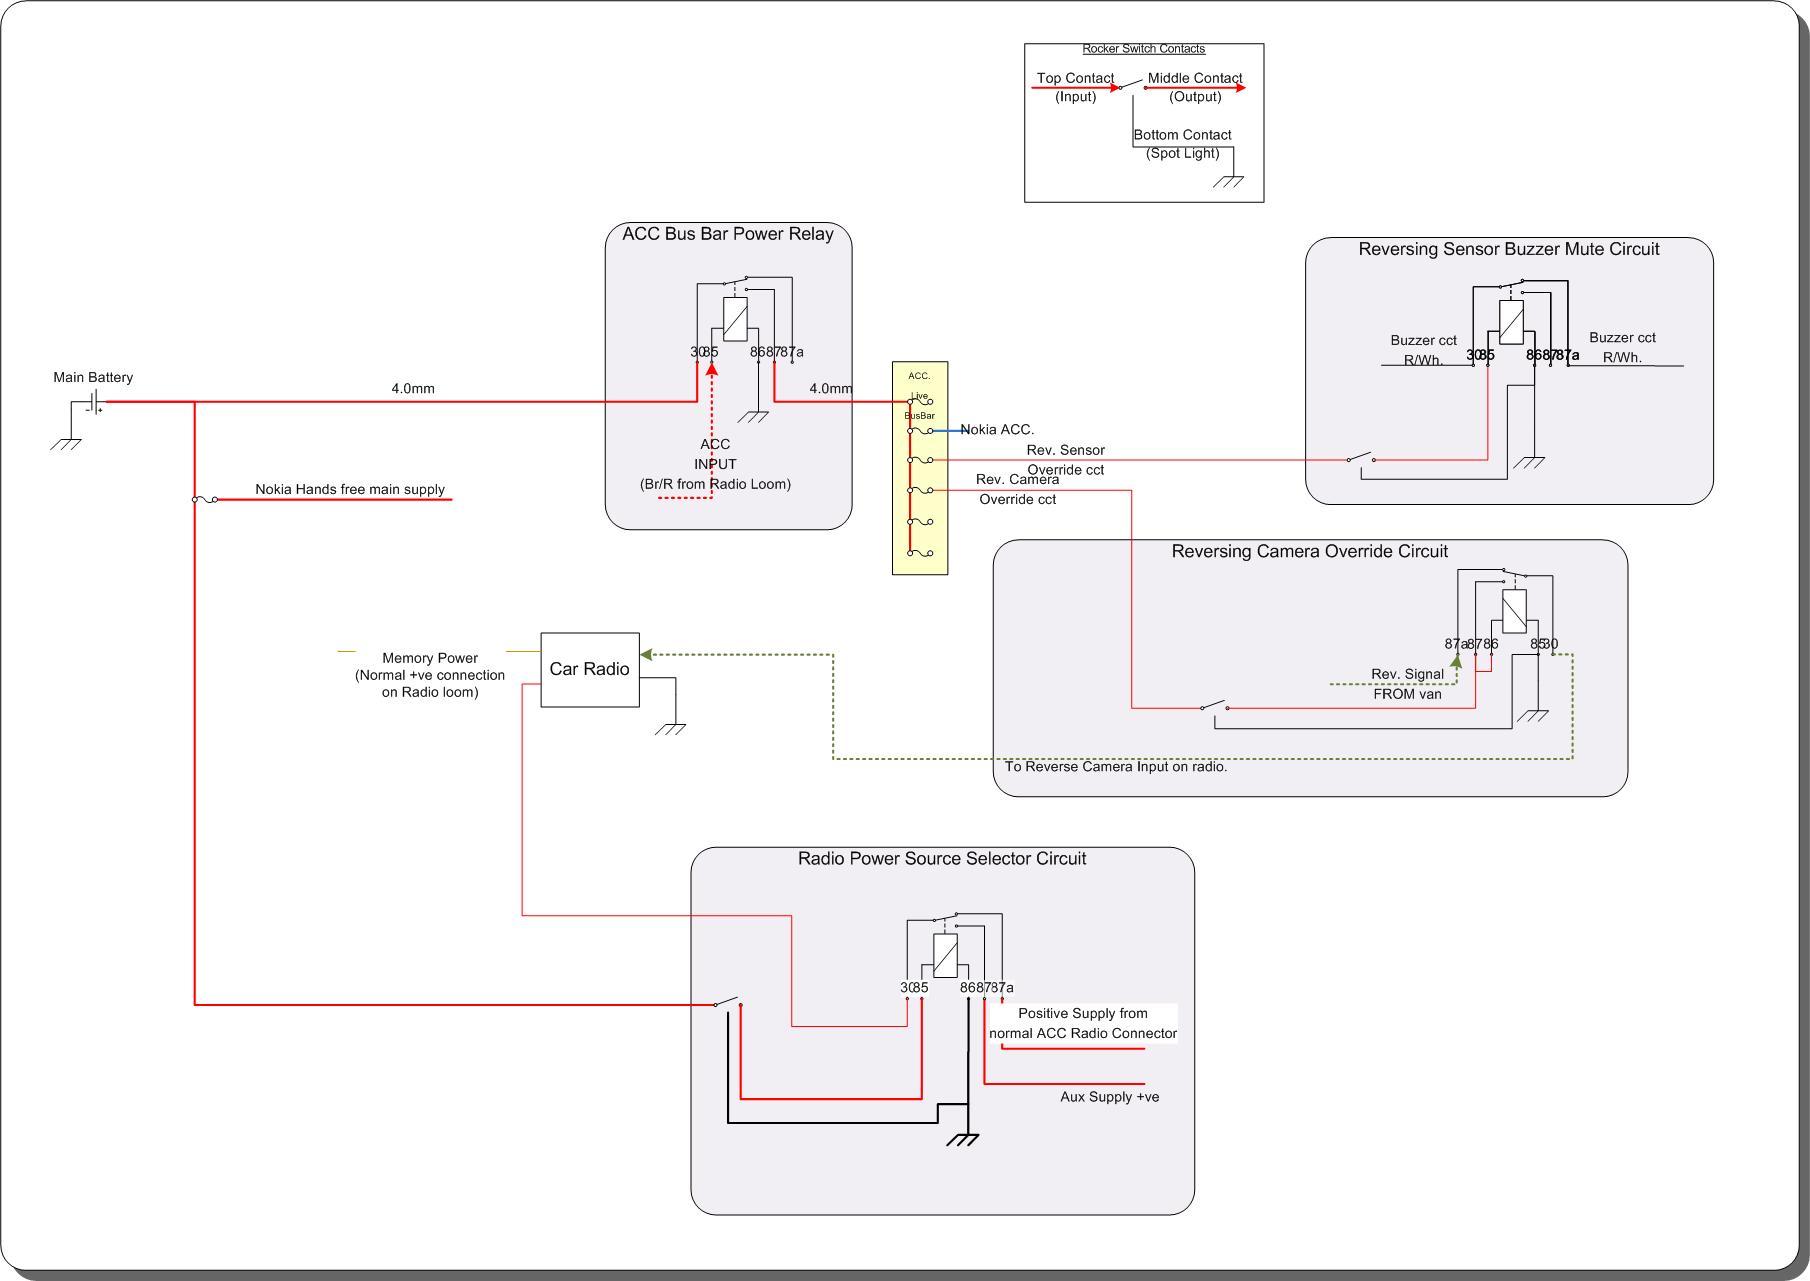 Vw transporter t5 central locking wiring diagram efcaviation com on vw t4 central locking wiring diagram VW Beetle Diagram BMW Wiring Diagrams